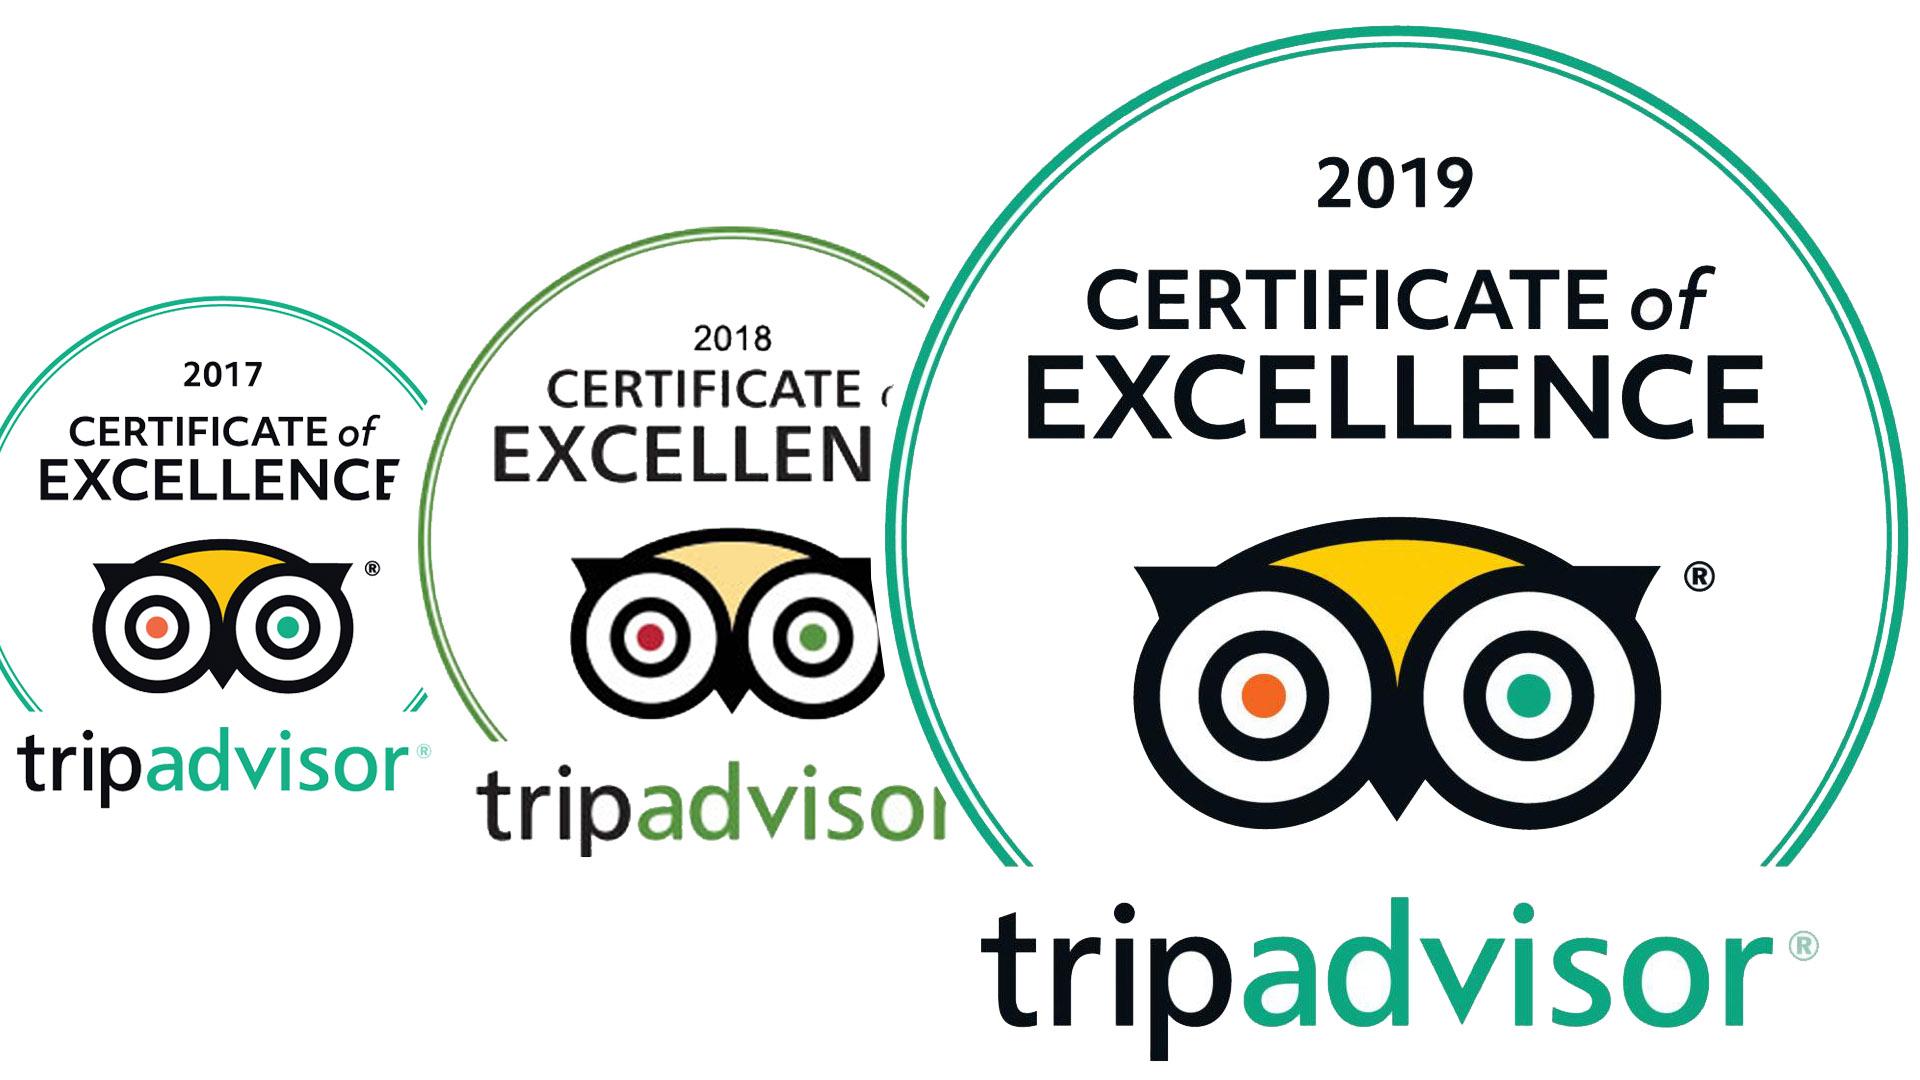 awards from trip advisor